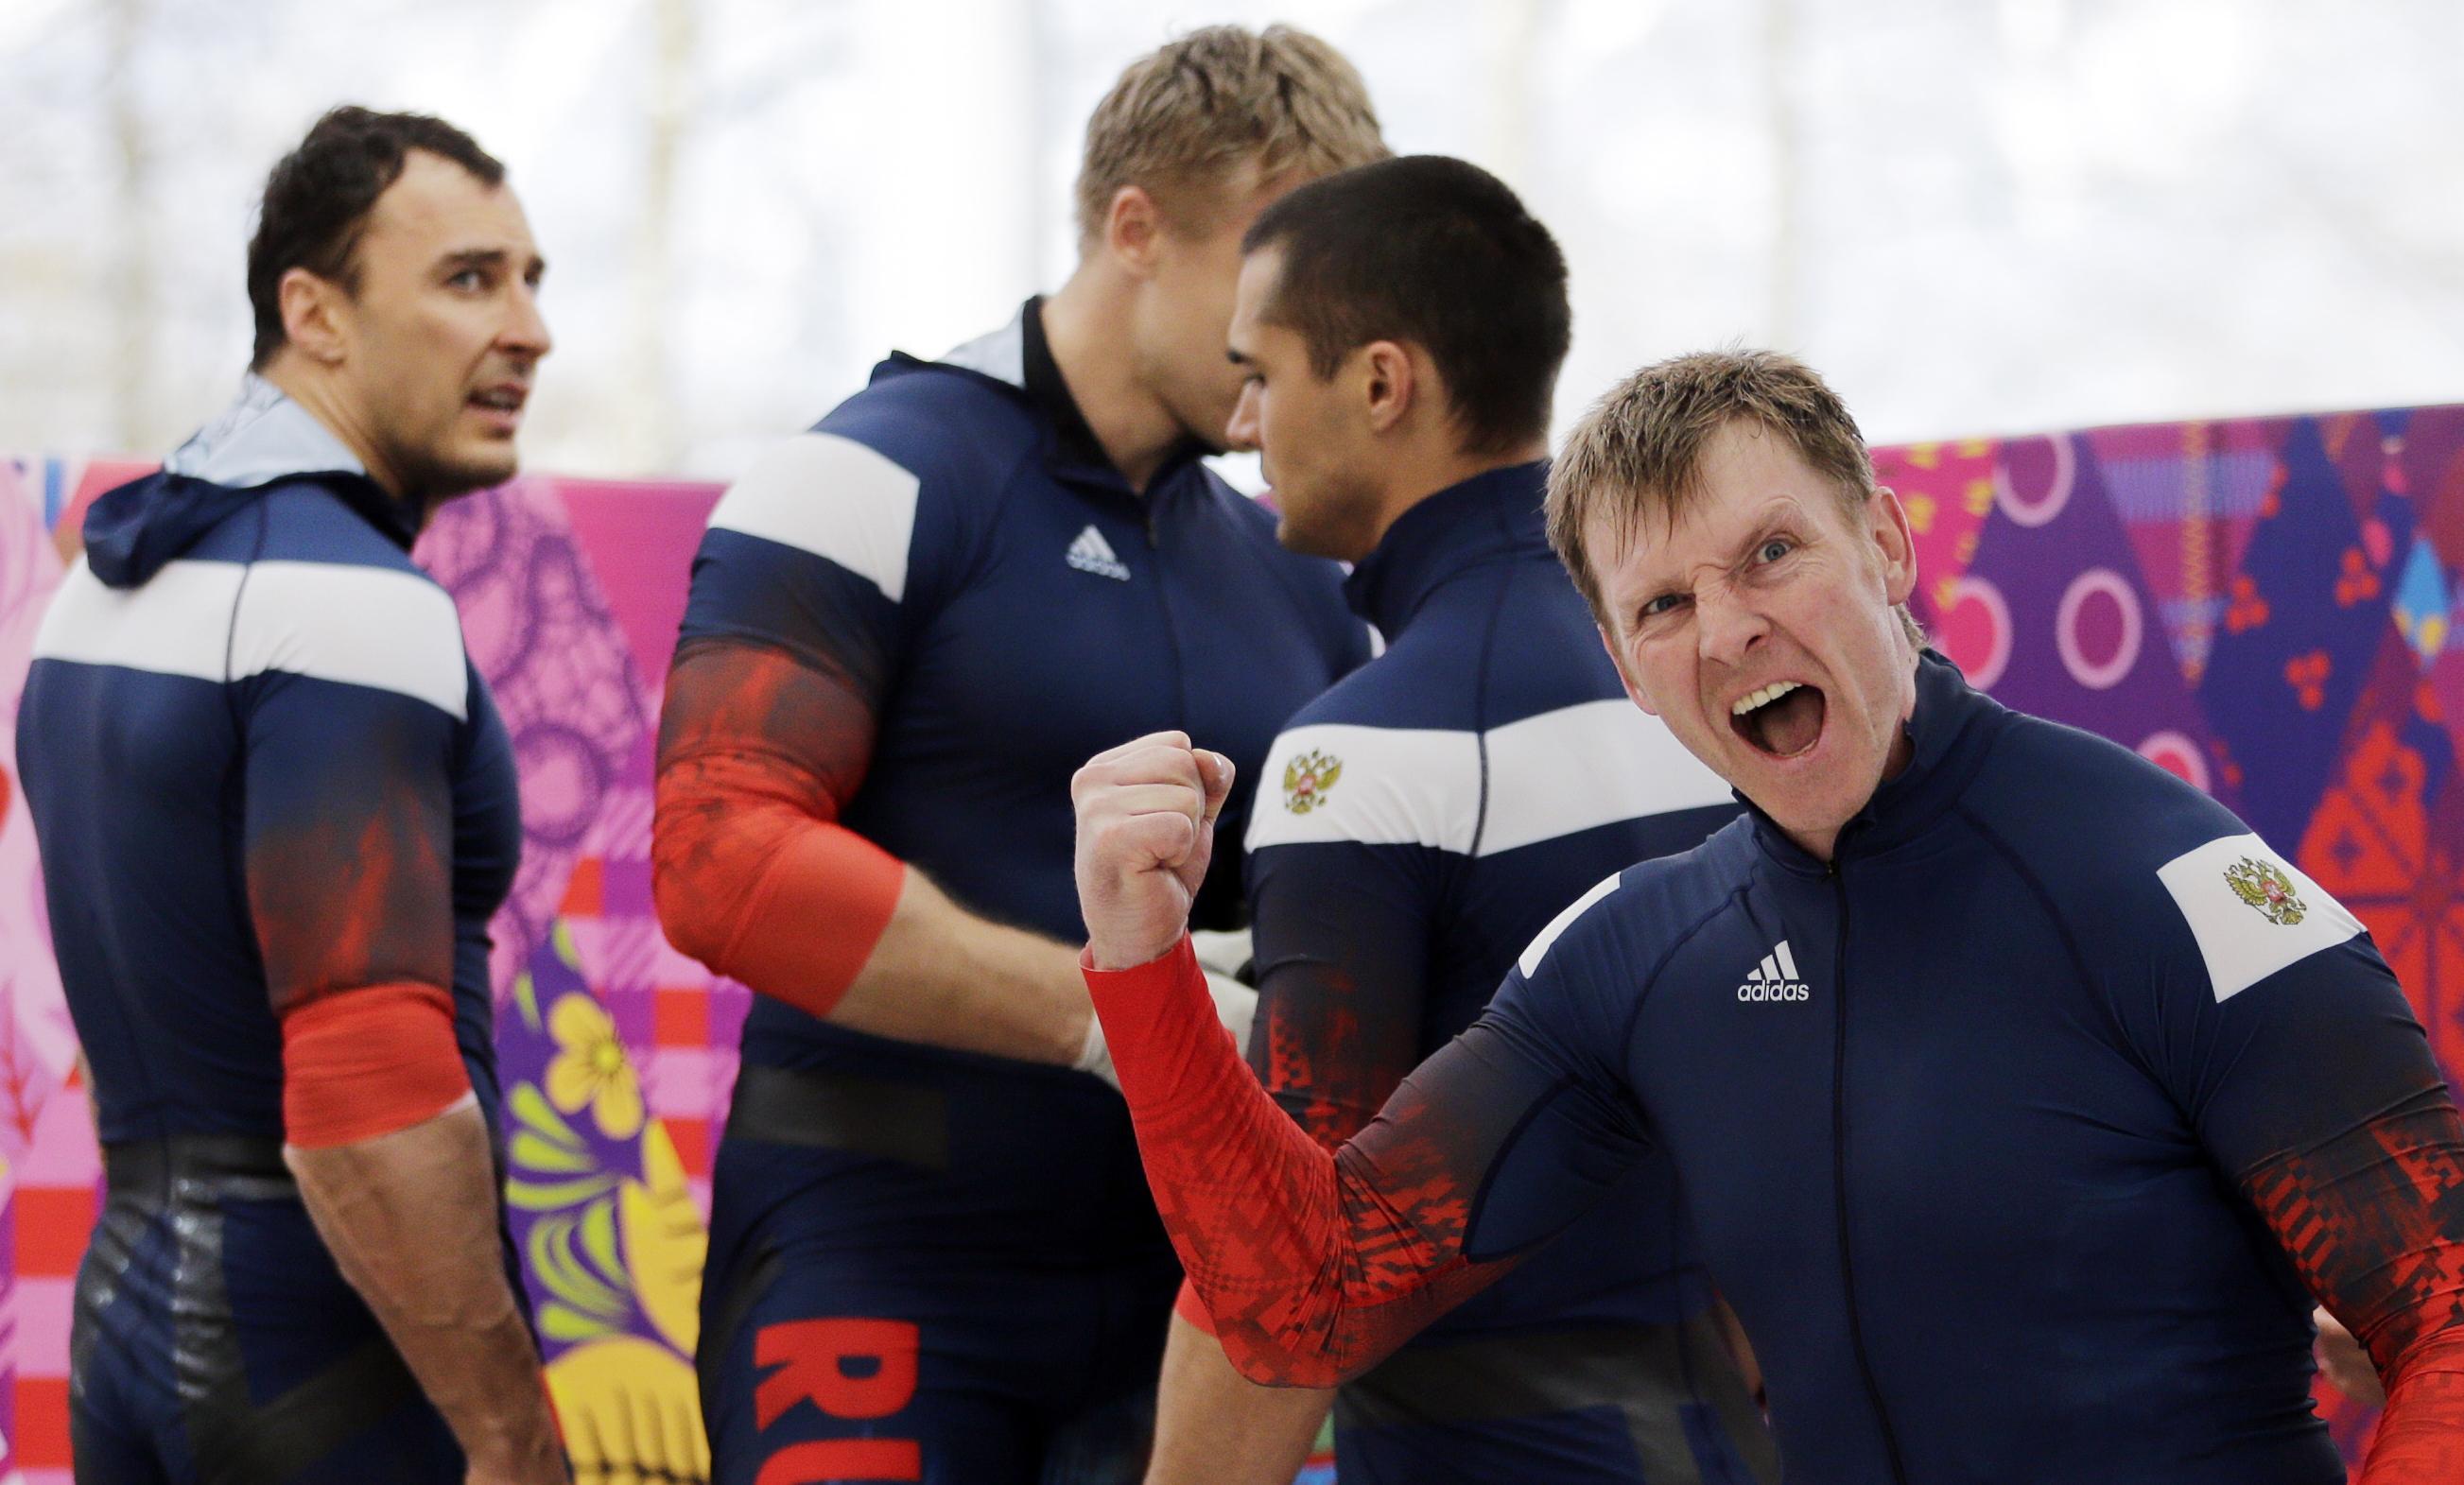 Column: Throw Russia out but keep Kenya in the Rio Games - Washington Times